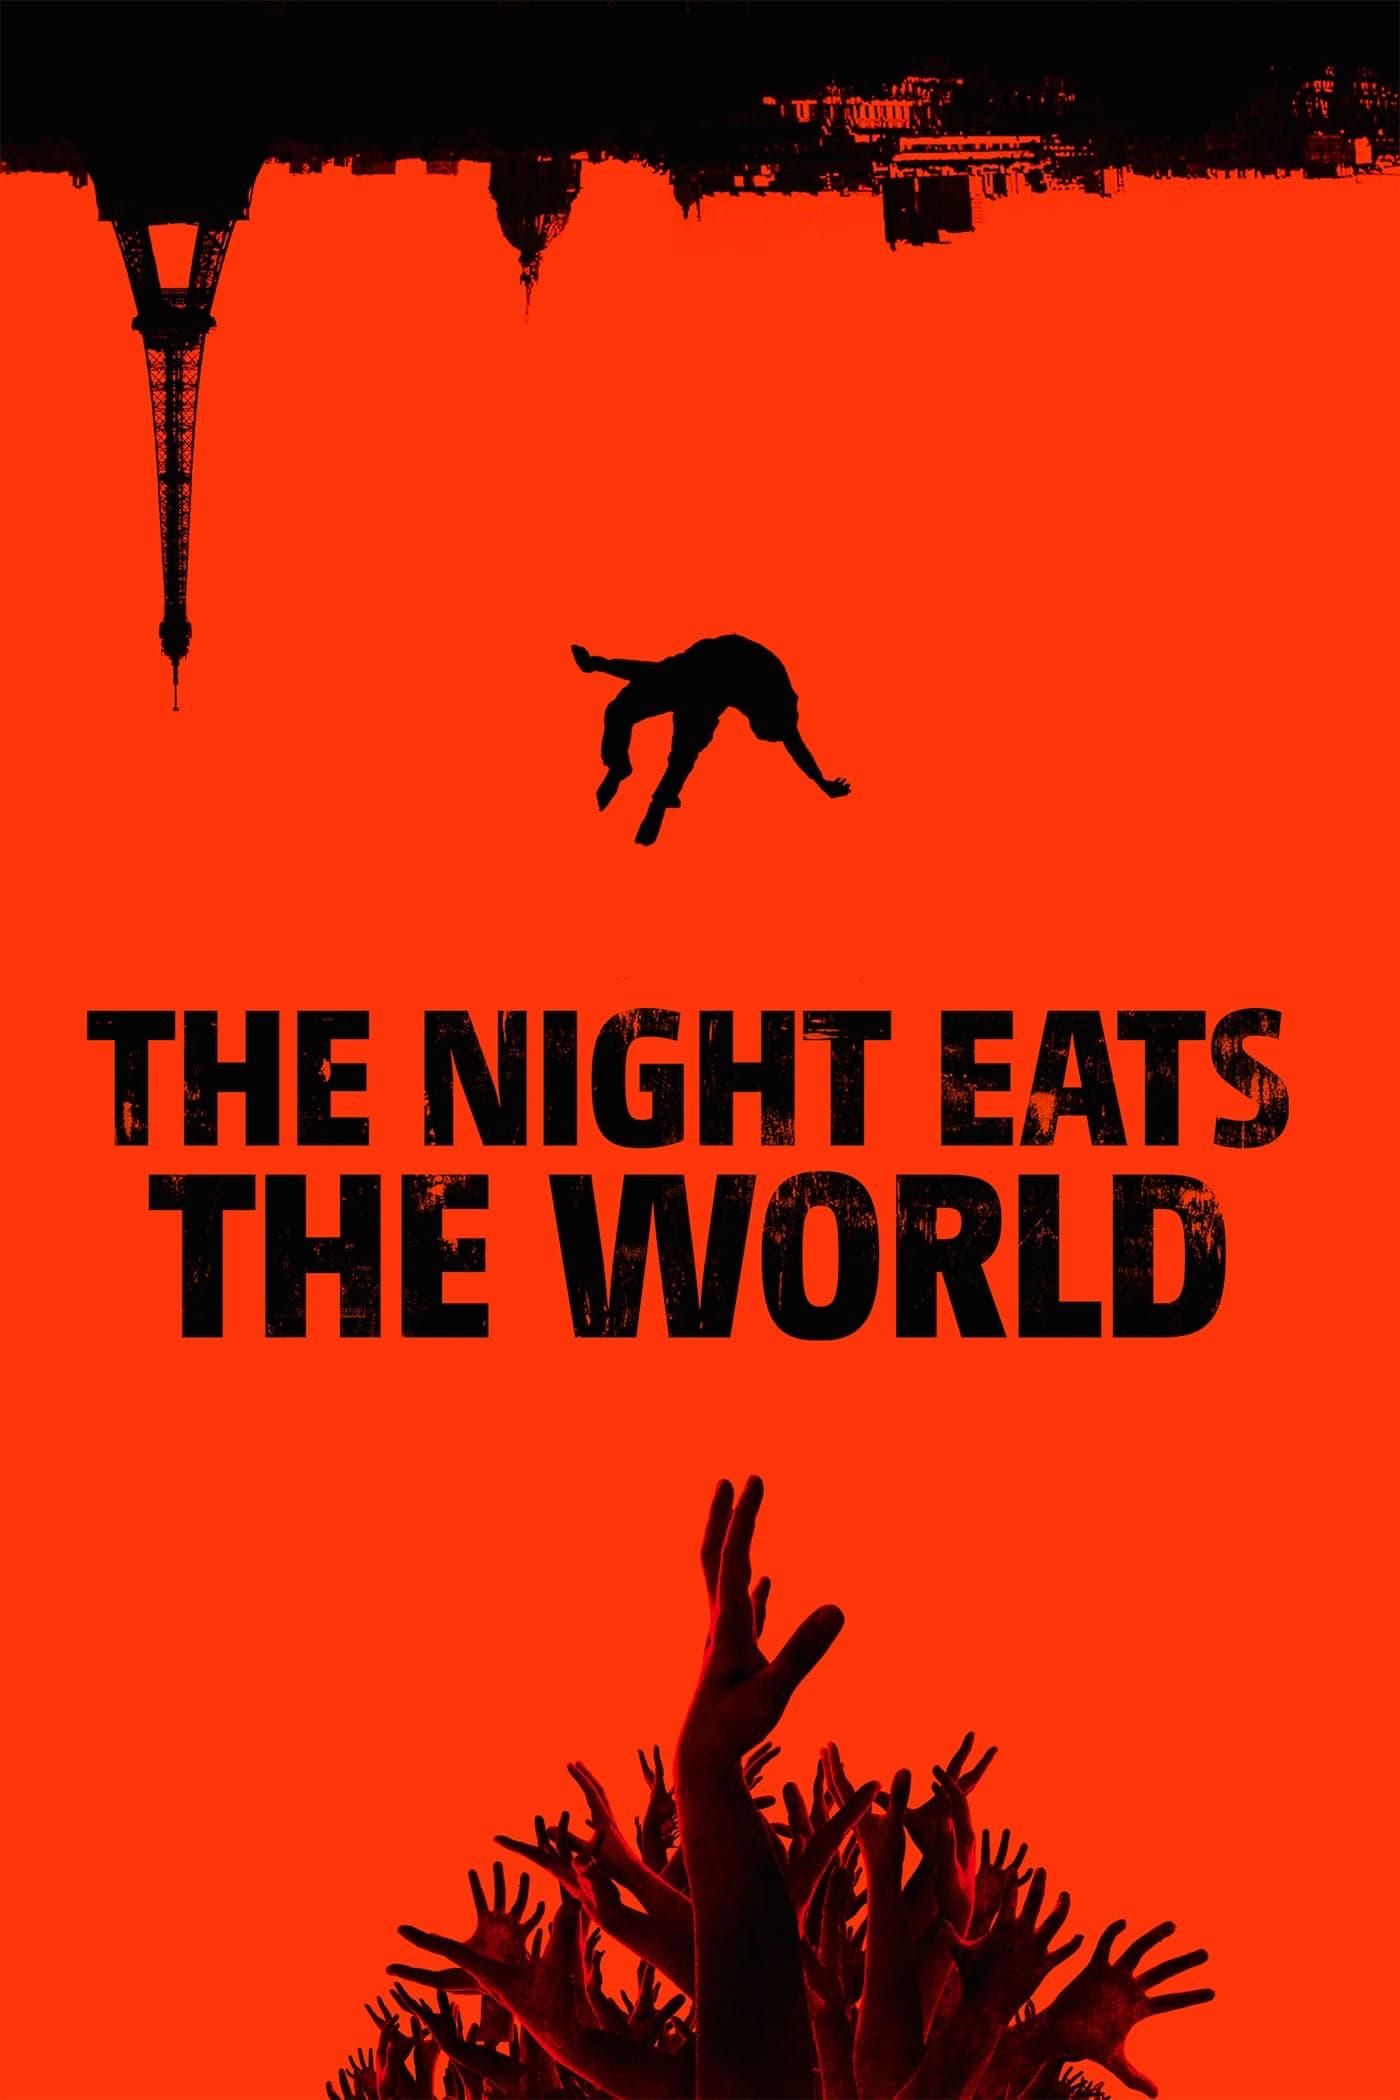 The Night Eats the World (2018)